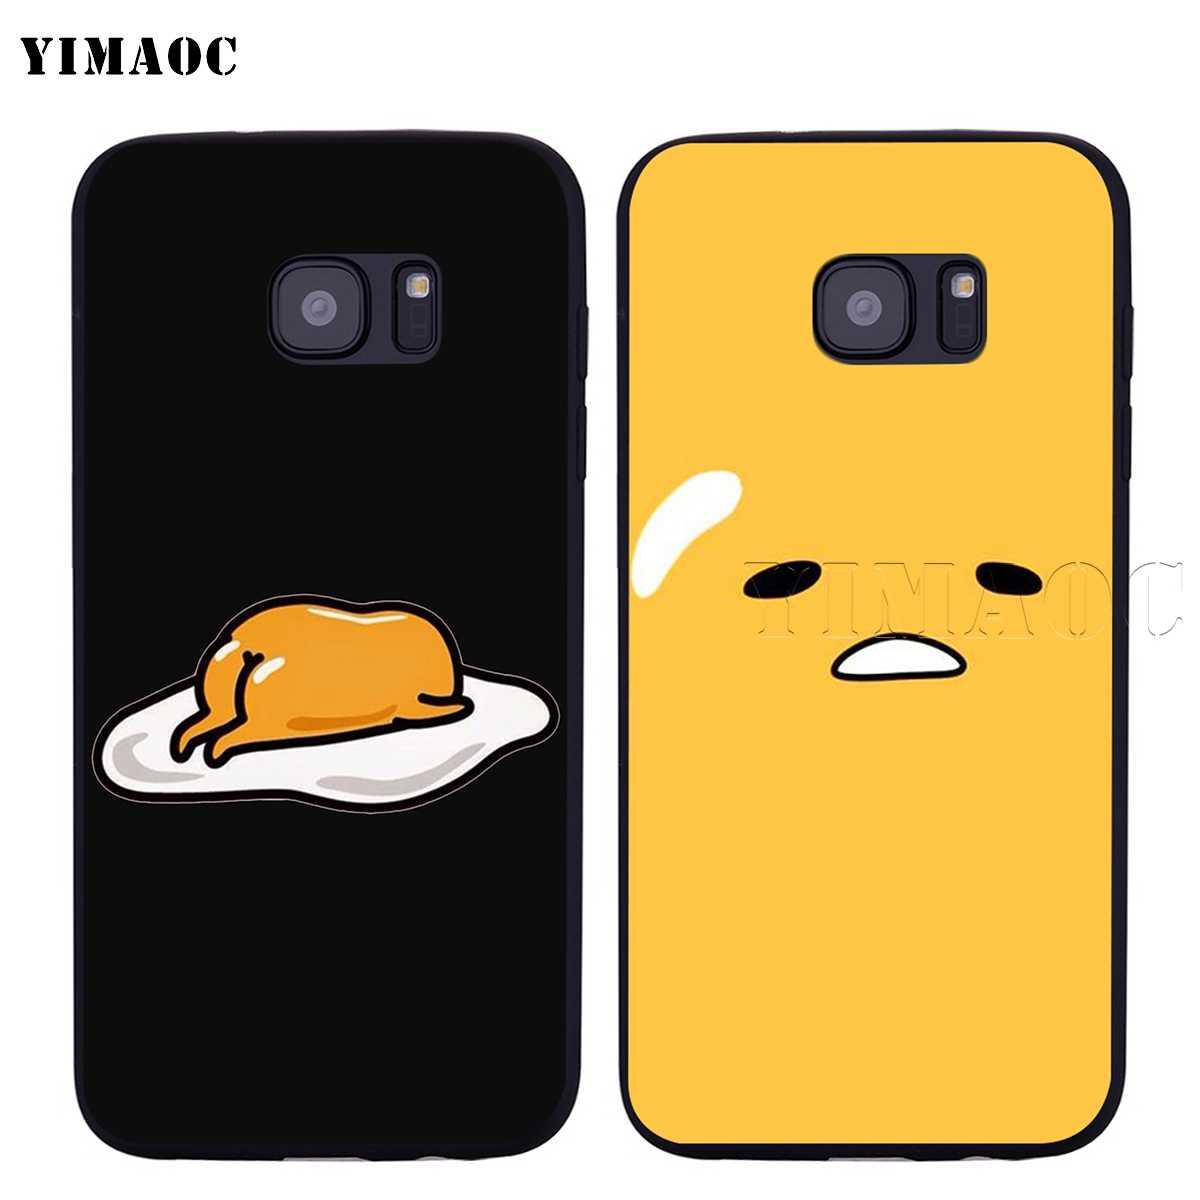 YIMAOC Gudetama 怠惰な卵サムスンギャラクシー A7 A8 A9 A10 A20 A30 A40 A50 A70 M10 M20 M30 s10 S10e J6 プラス